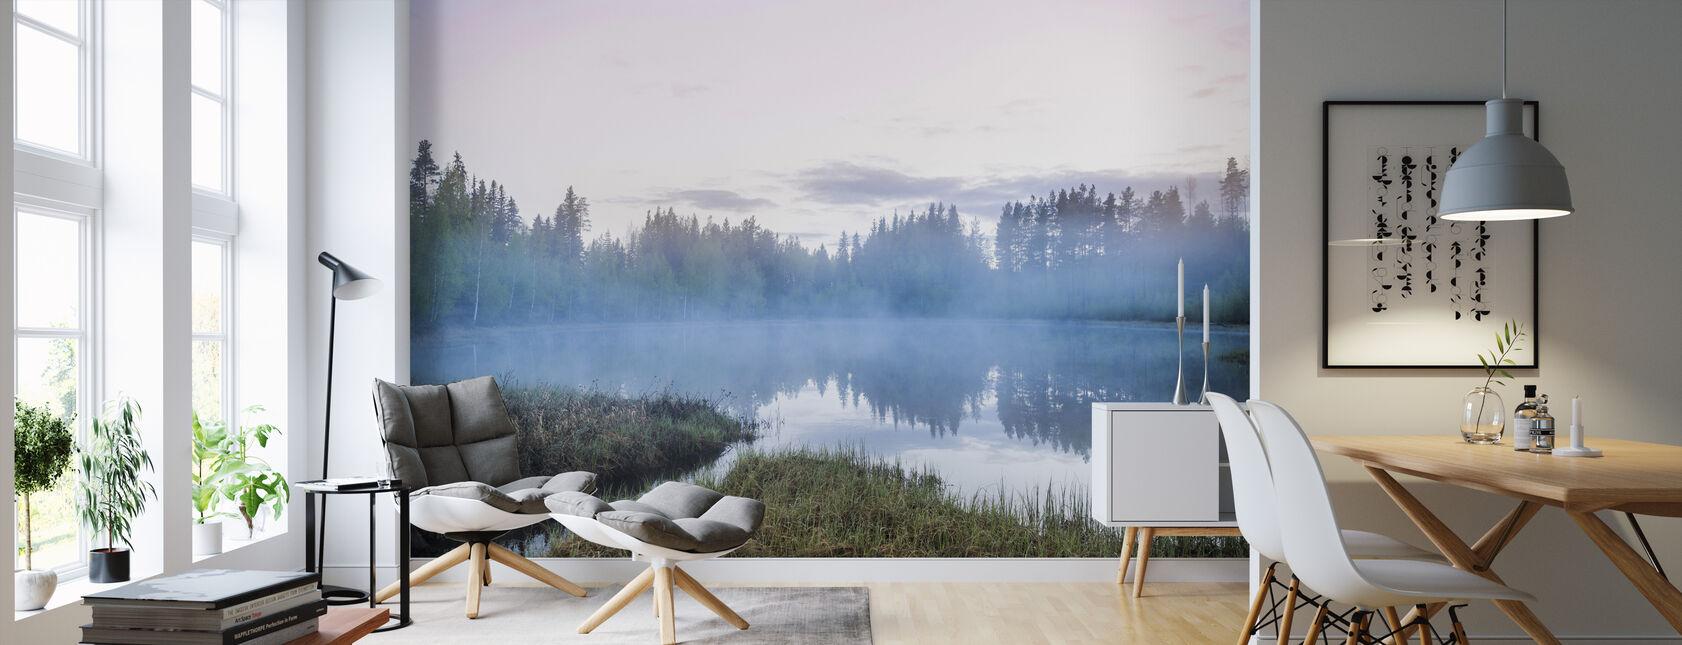 Colors of June - Wallpaper - Living Room